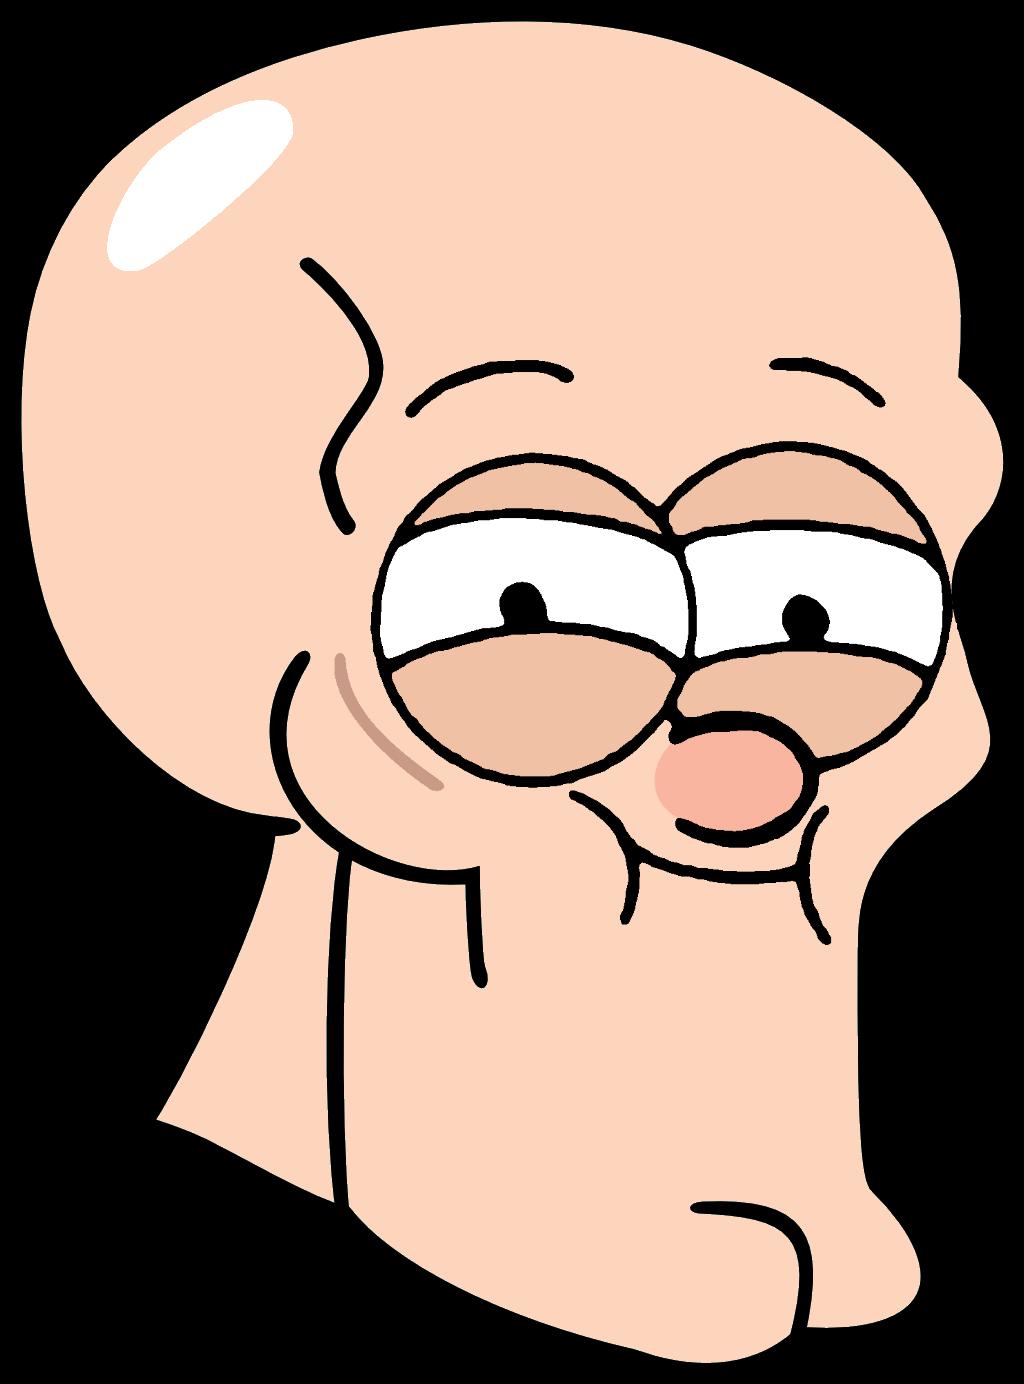 Handsome Jack The Dipper | Handsome Squidward / Squidward ...